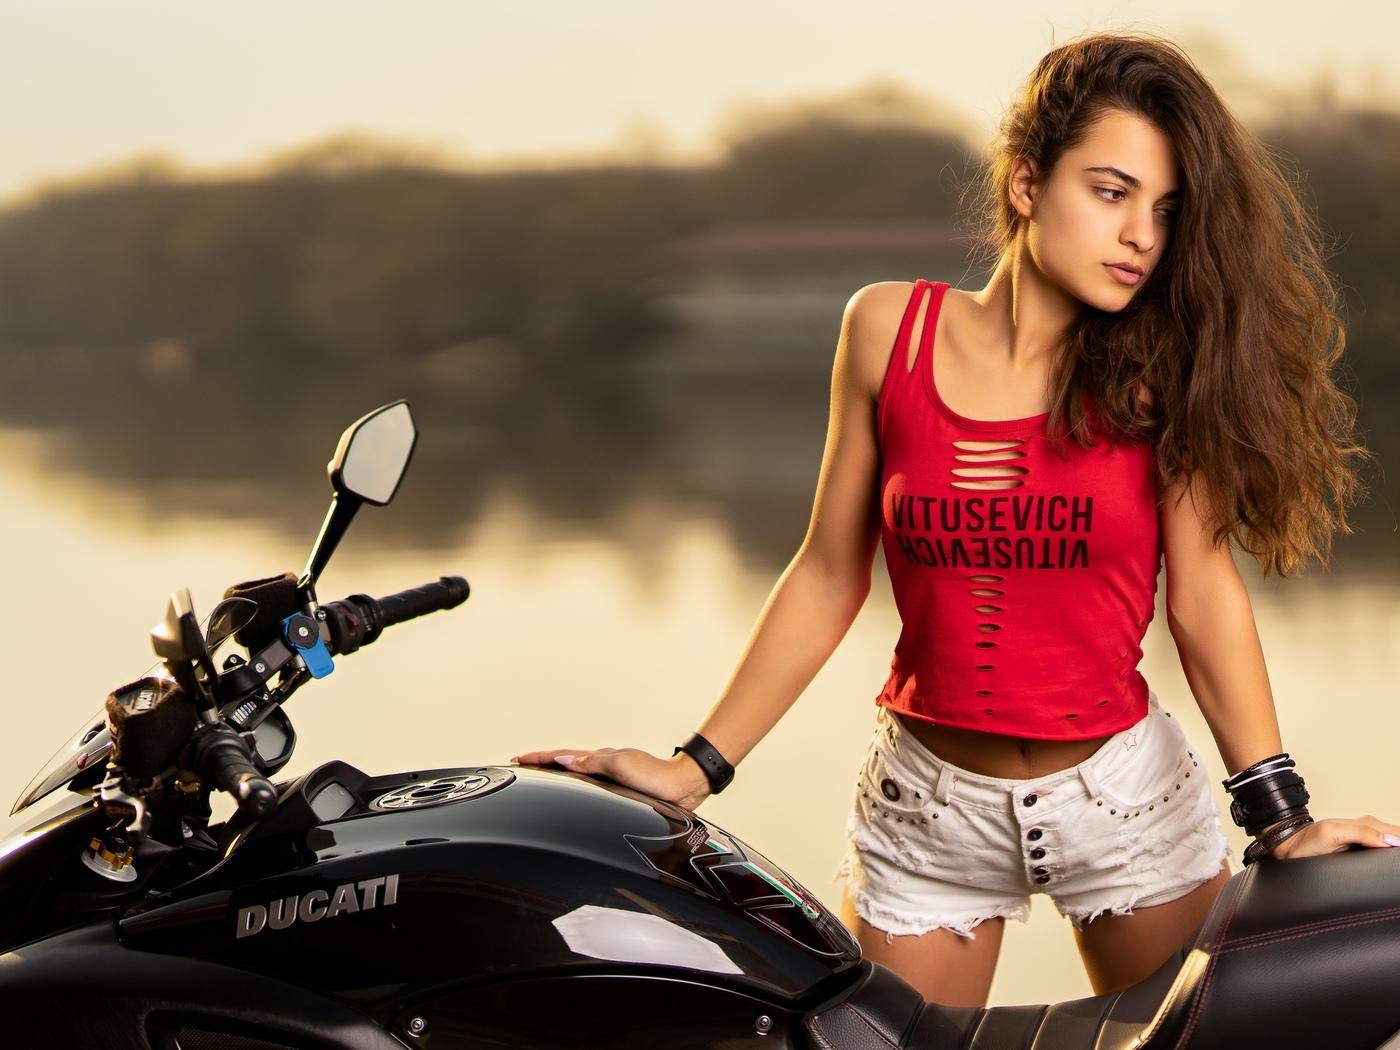 beautiful-girl-with-ducati-v5.jpg